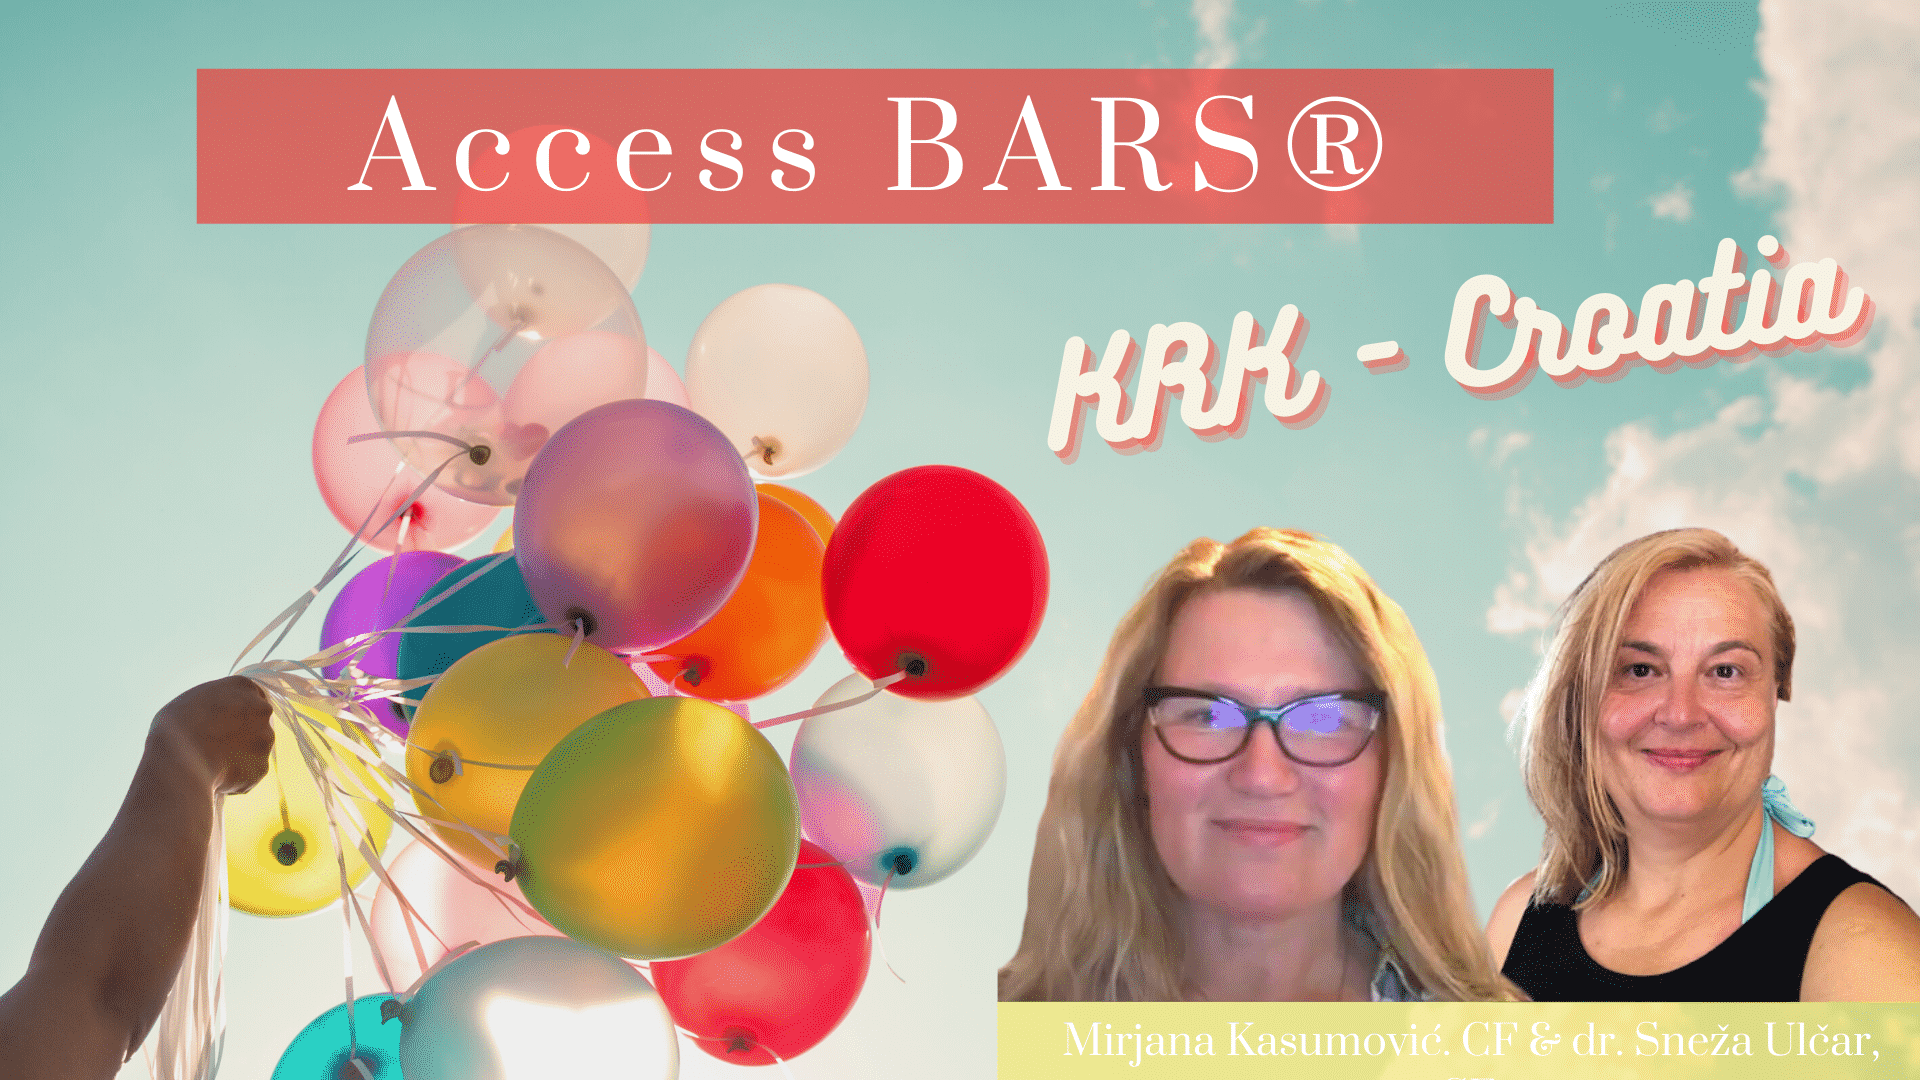 Access BARS® radionica na otoku KRK